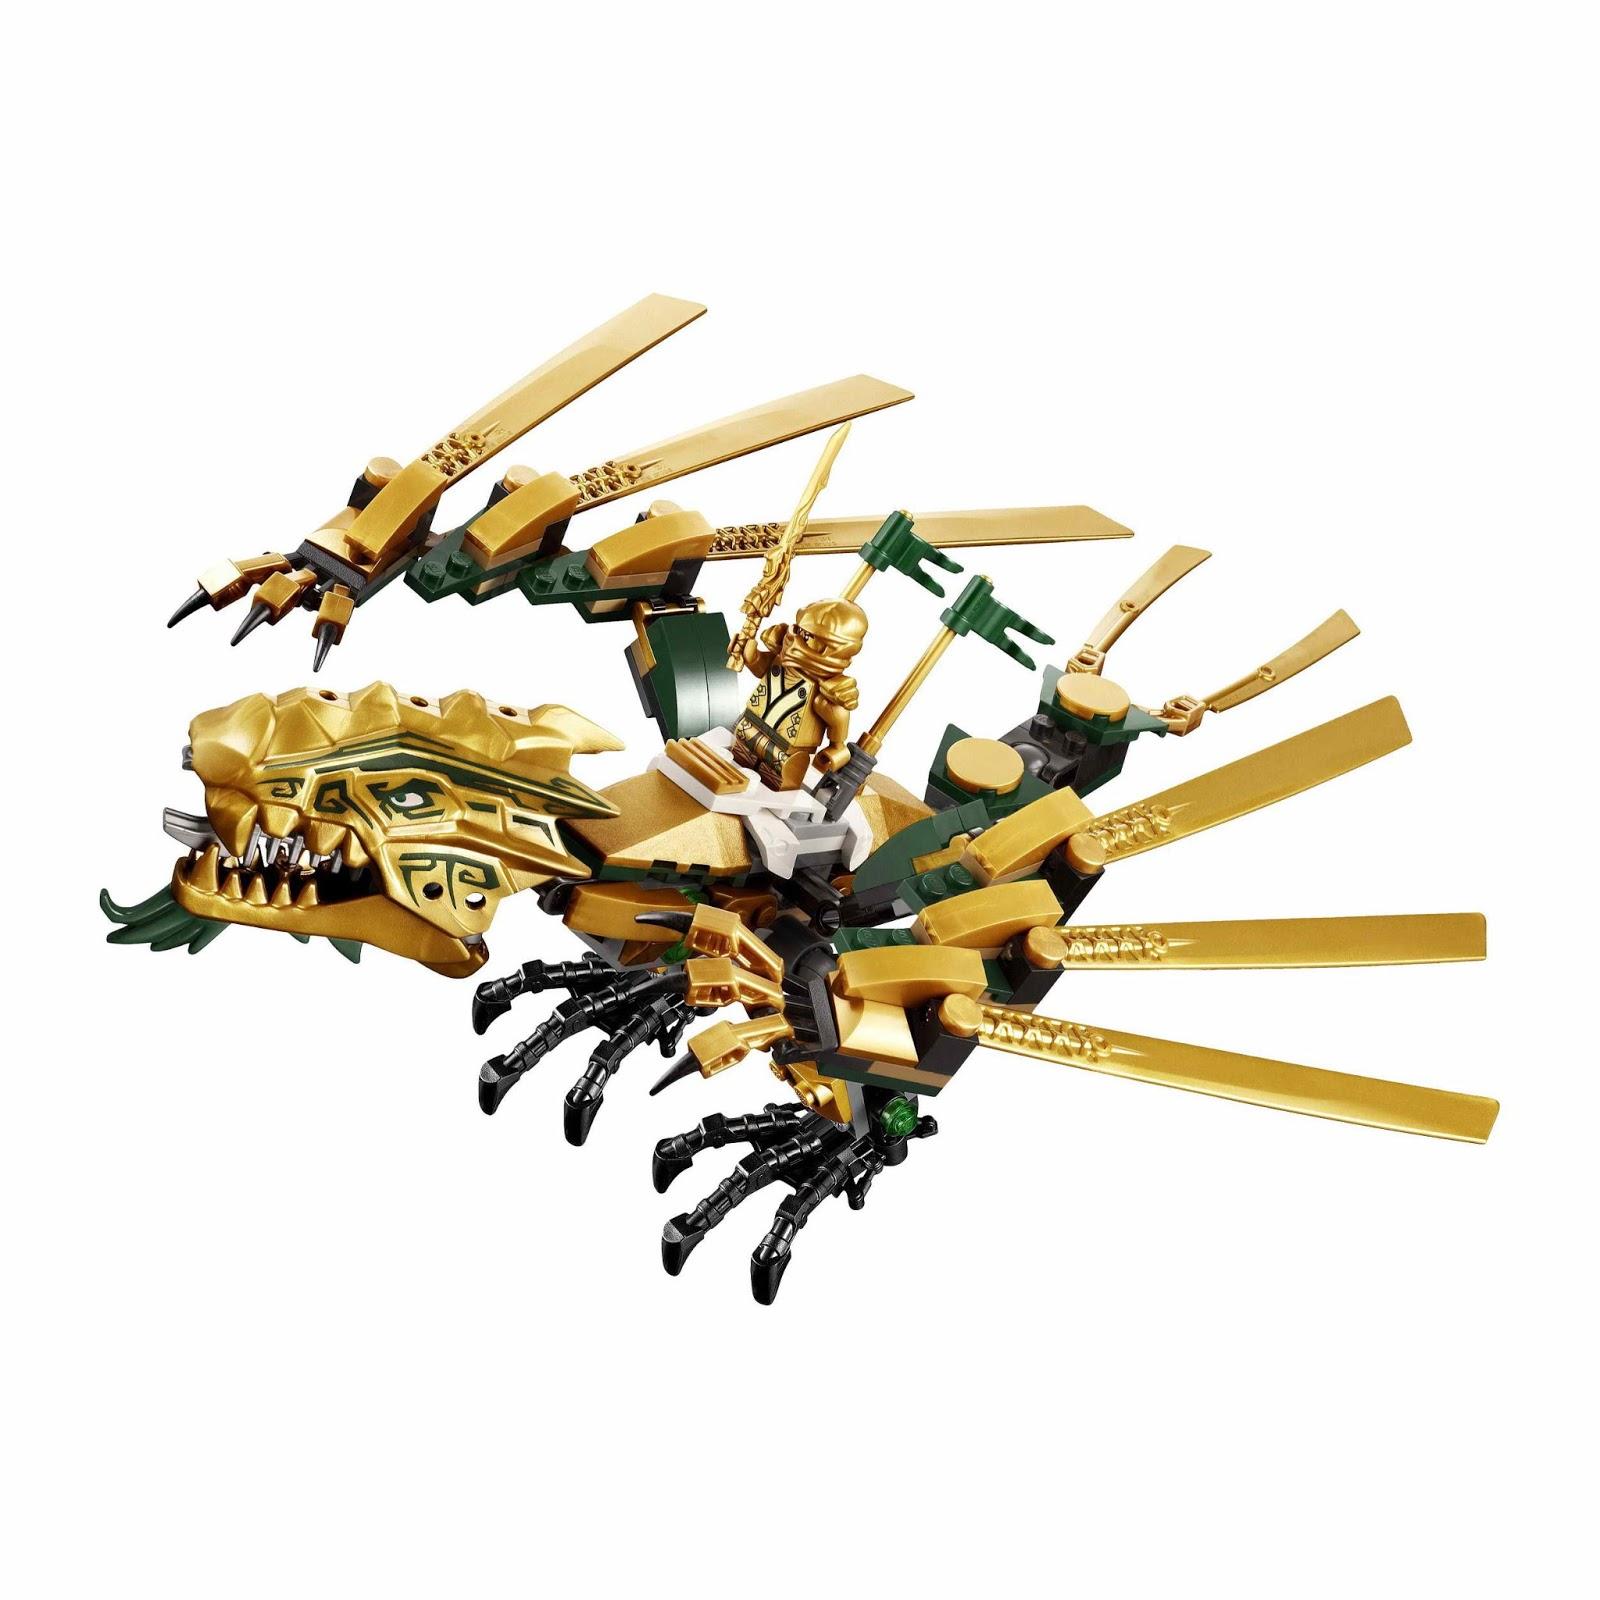 Lego Ninjago Dragon REPUBbLICk: set databa...